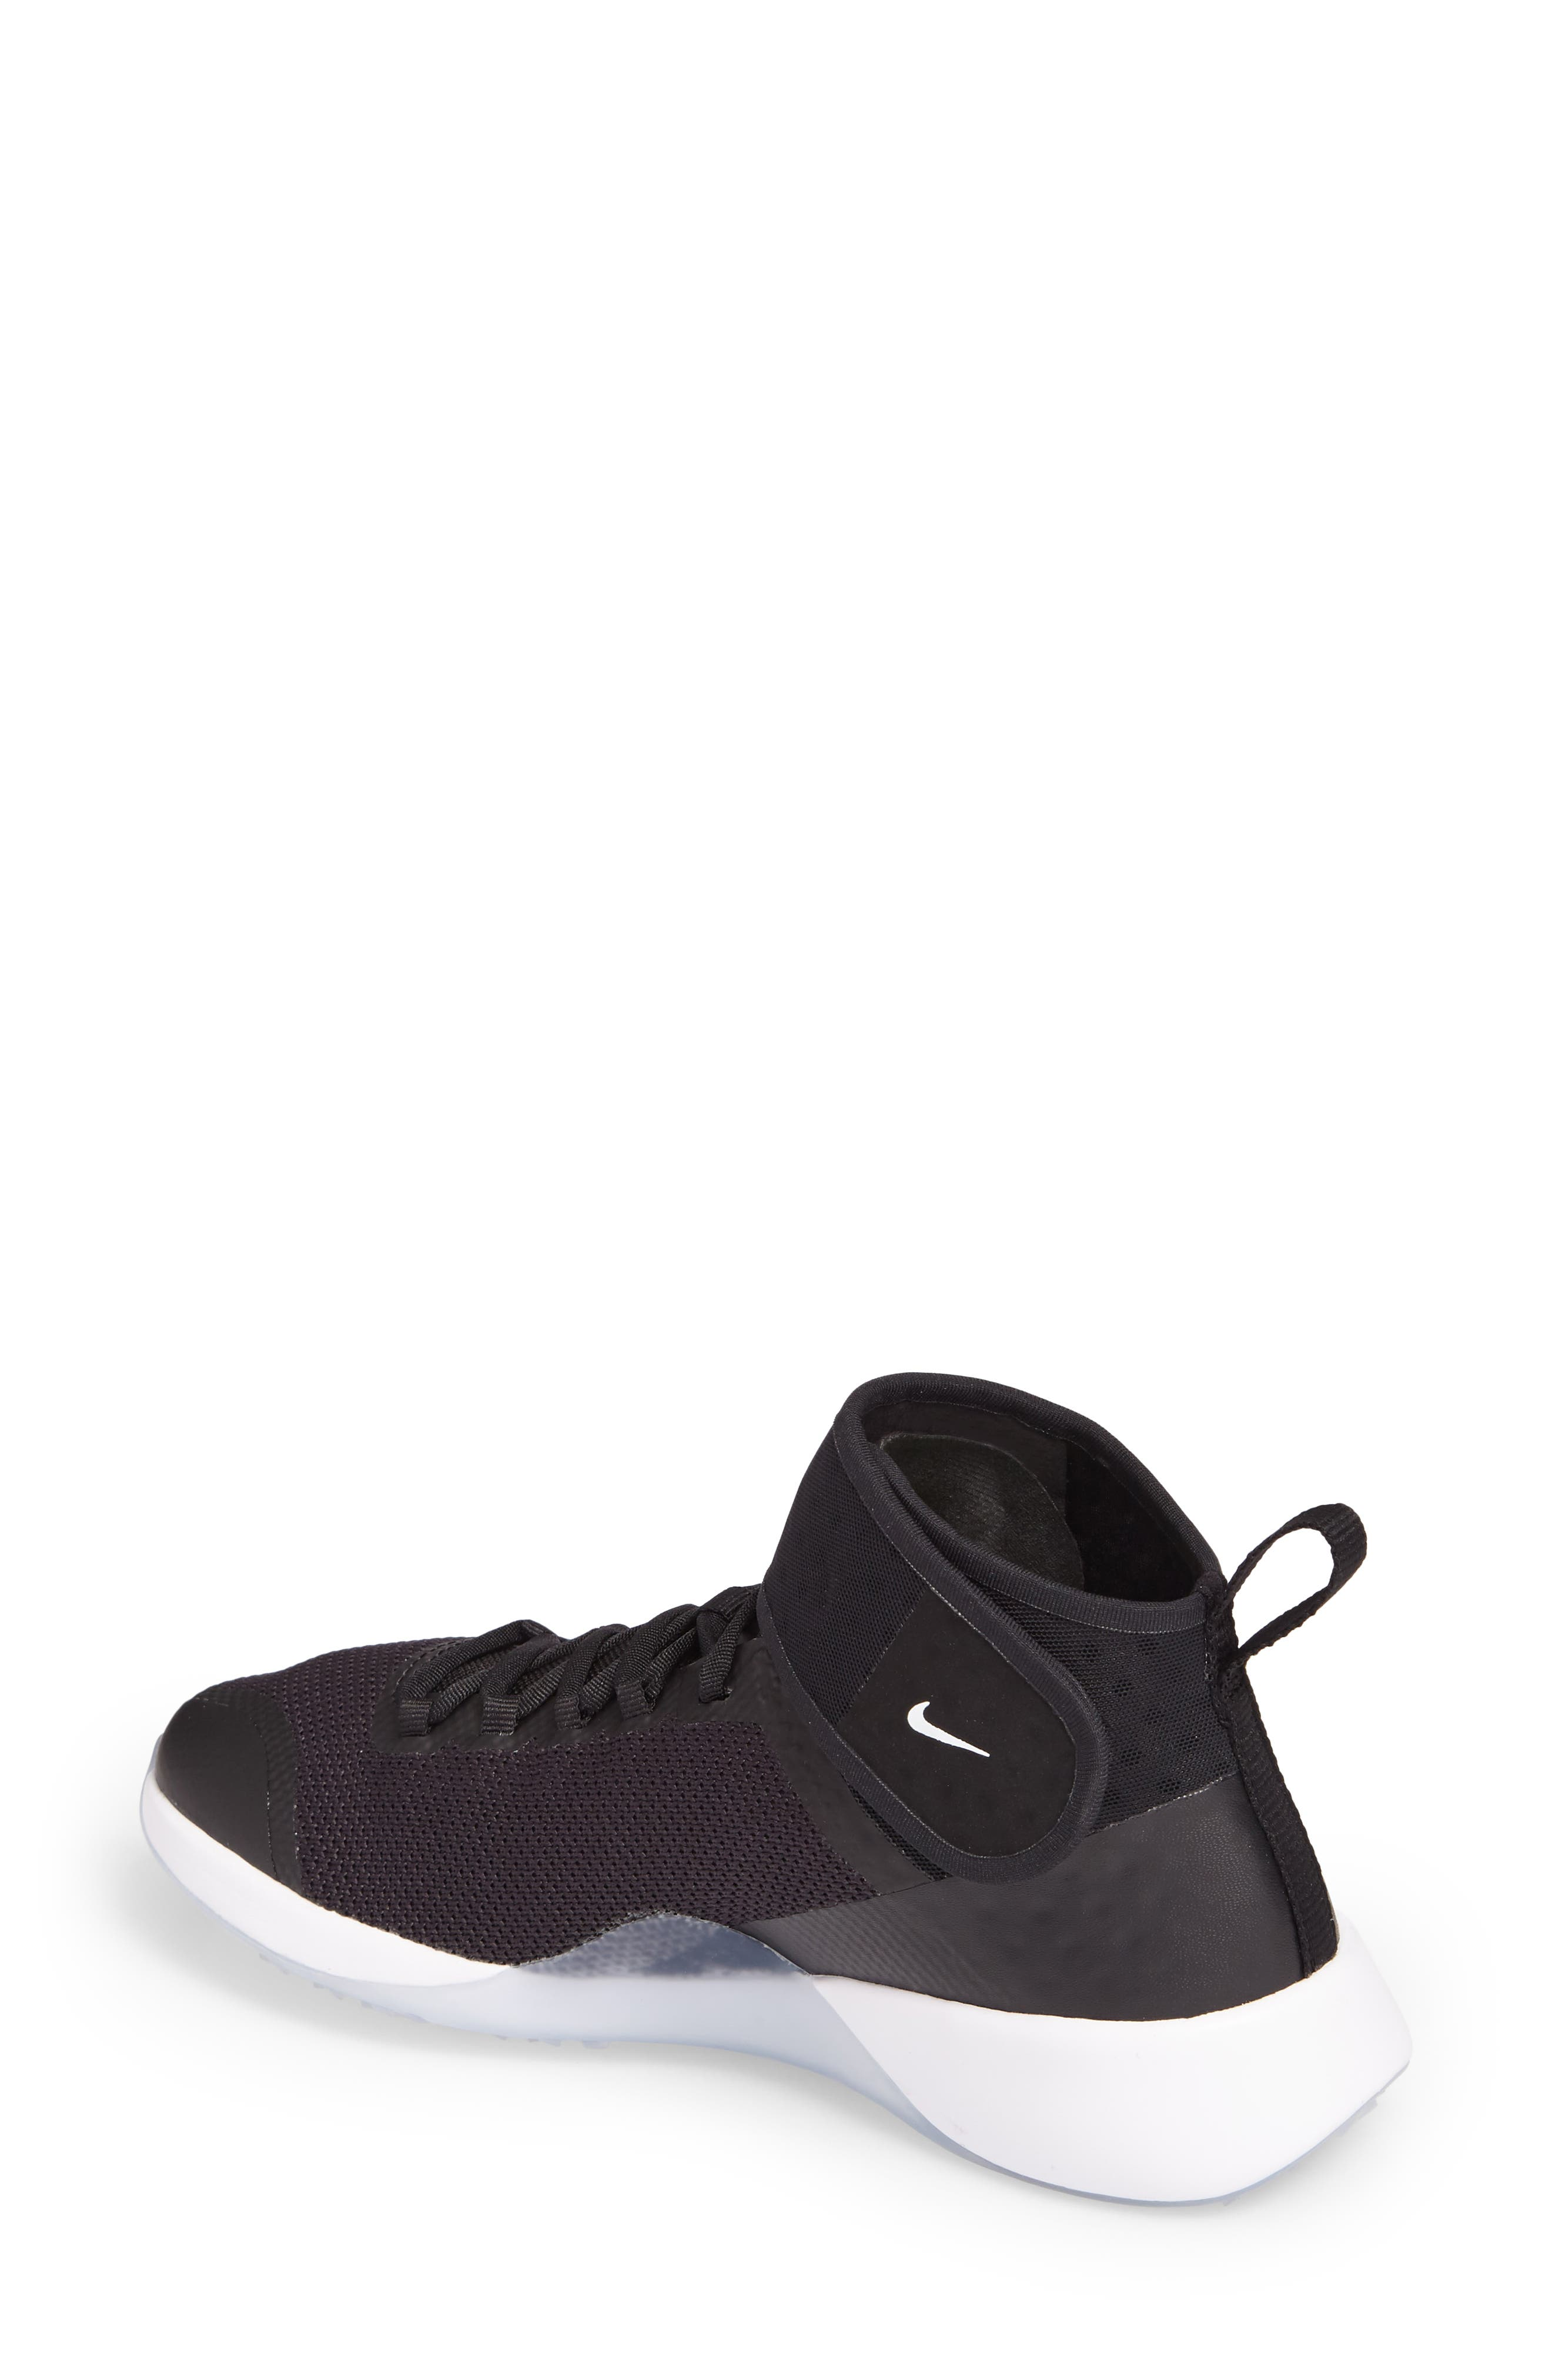 NikeLab Air Zoom Strong 2 Training Shoe,                             Alternate thumbnail 2, color,                             Black/ White